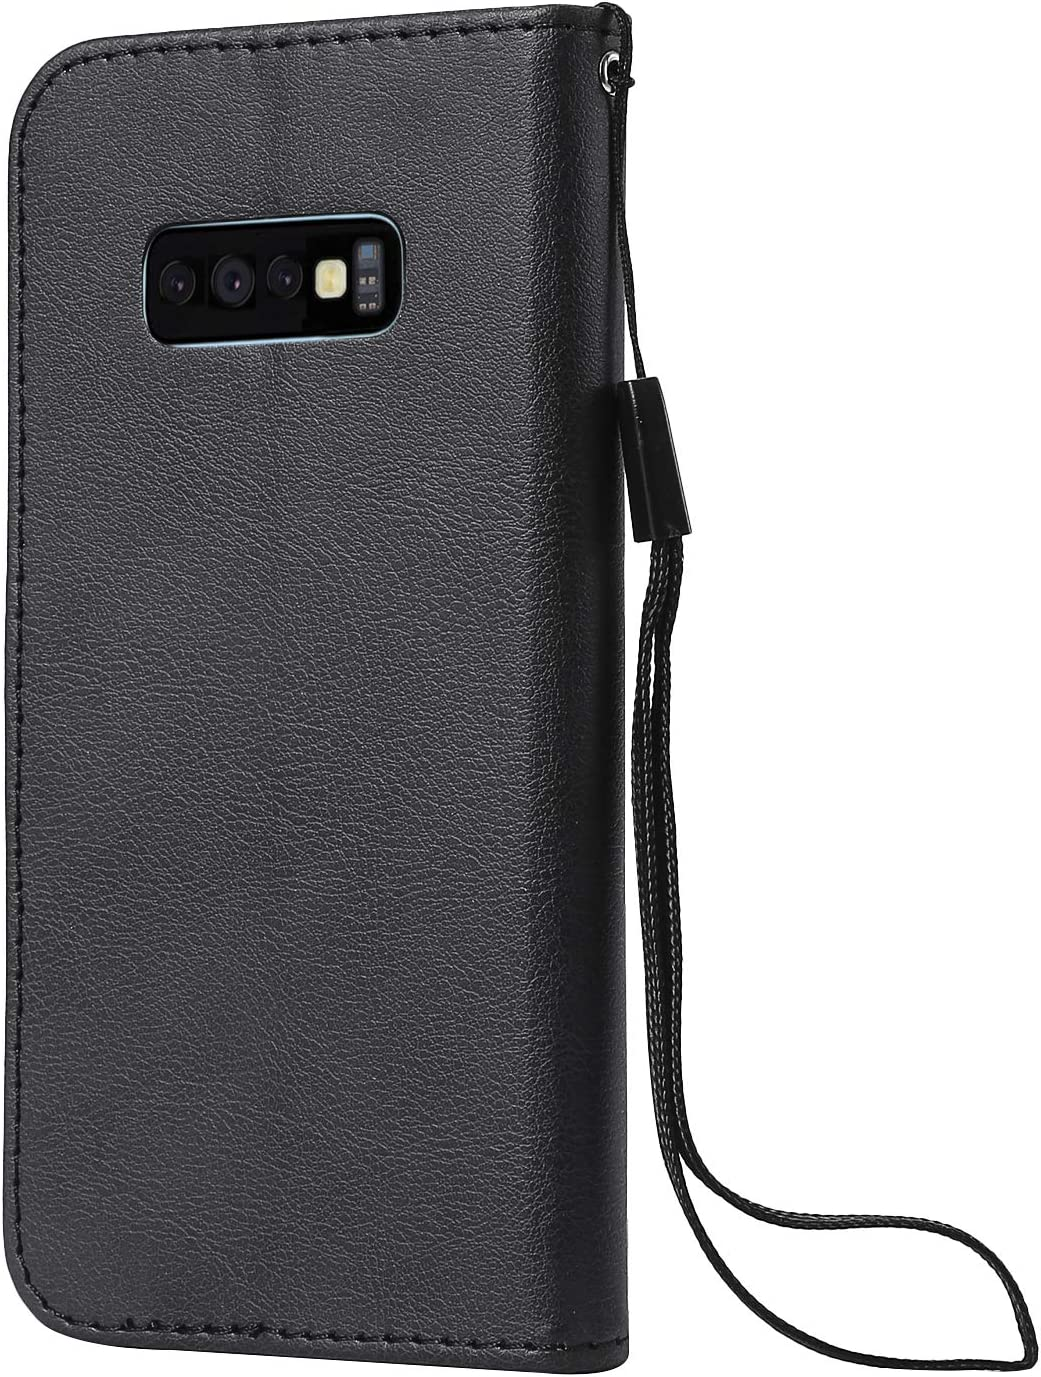 NEXCURIO Galaxy S10e Wallet Case with Card Holder Folding Kickstand Leather Case Flip Cover for Samsung Galaxy S10e NEKTU20887 Black